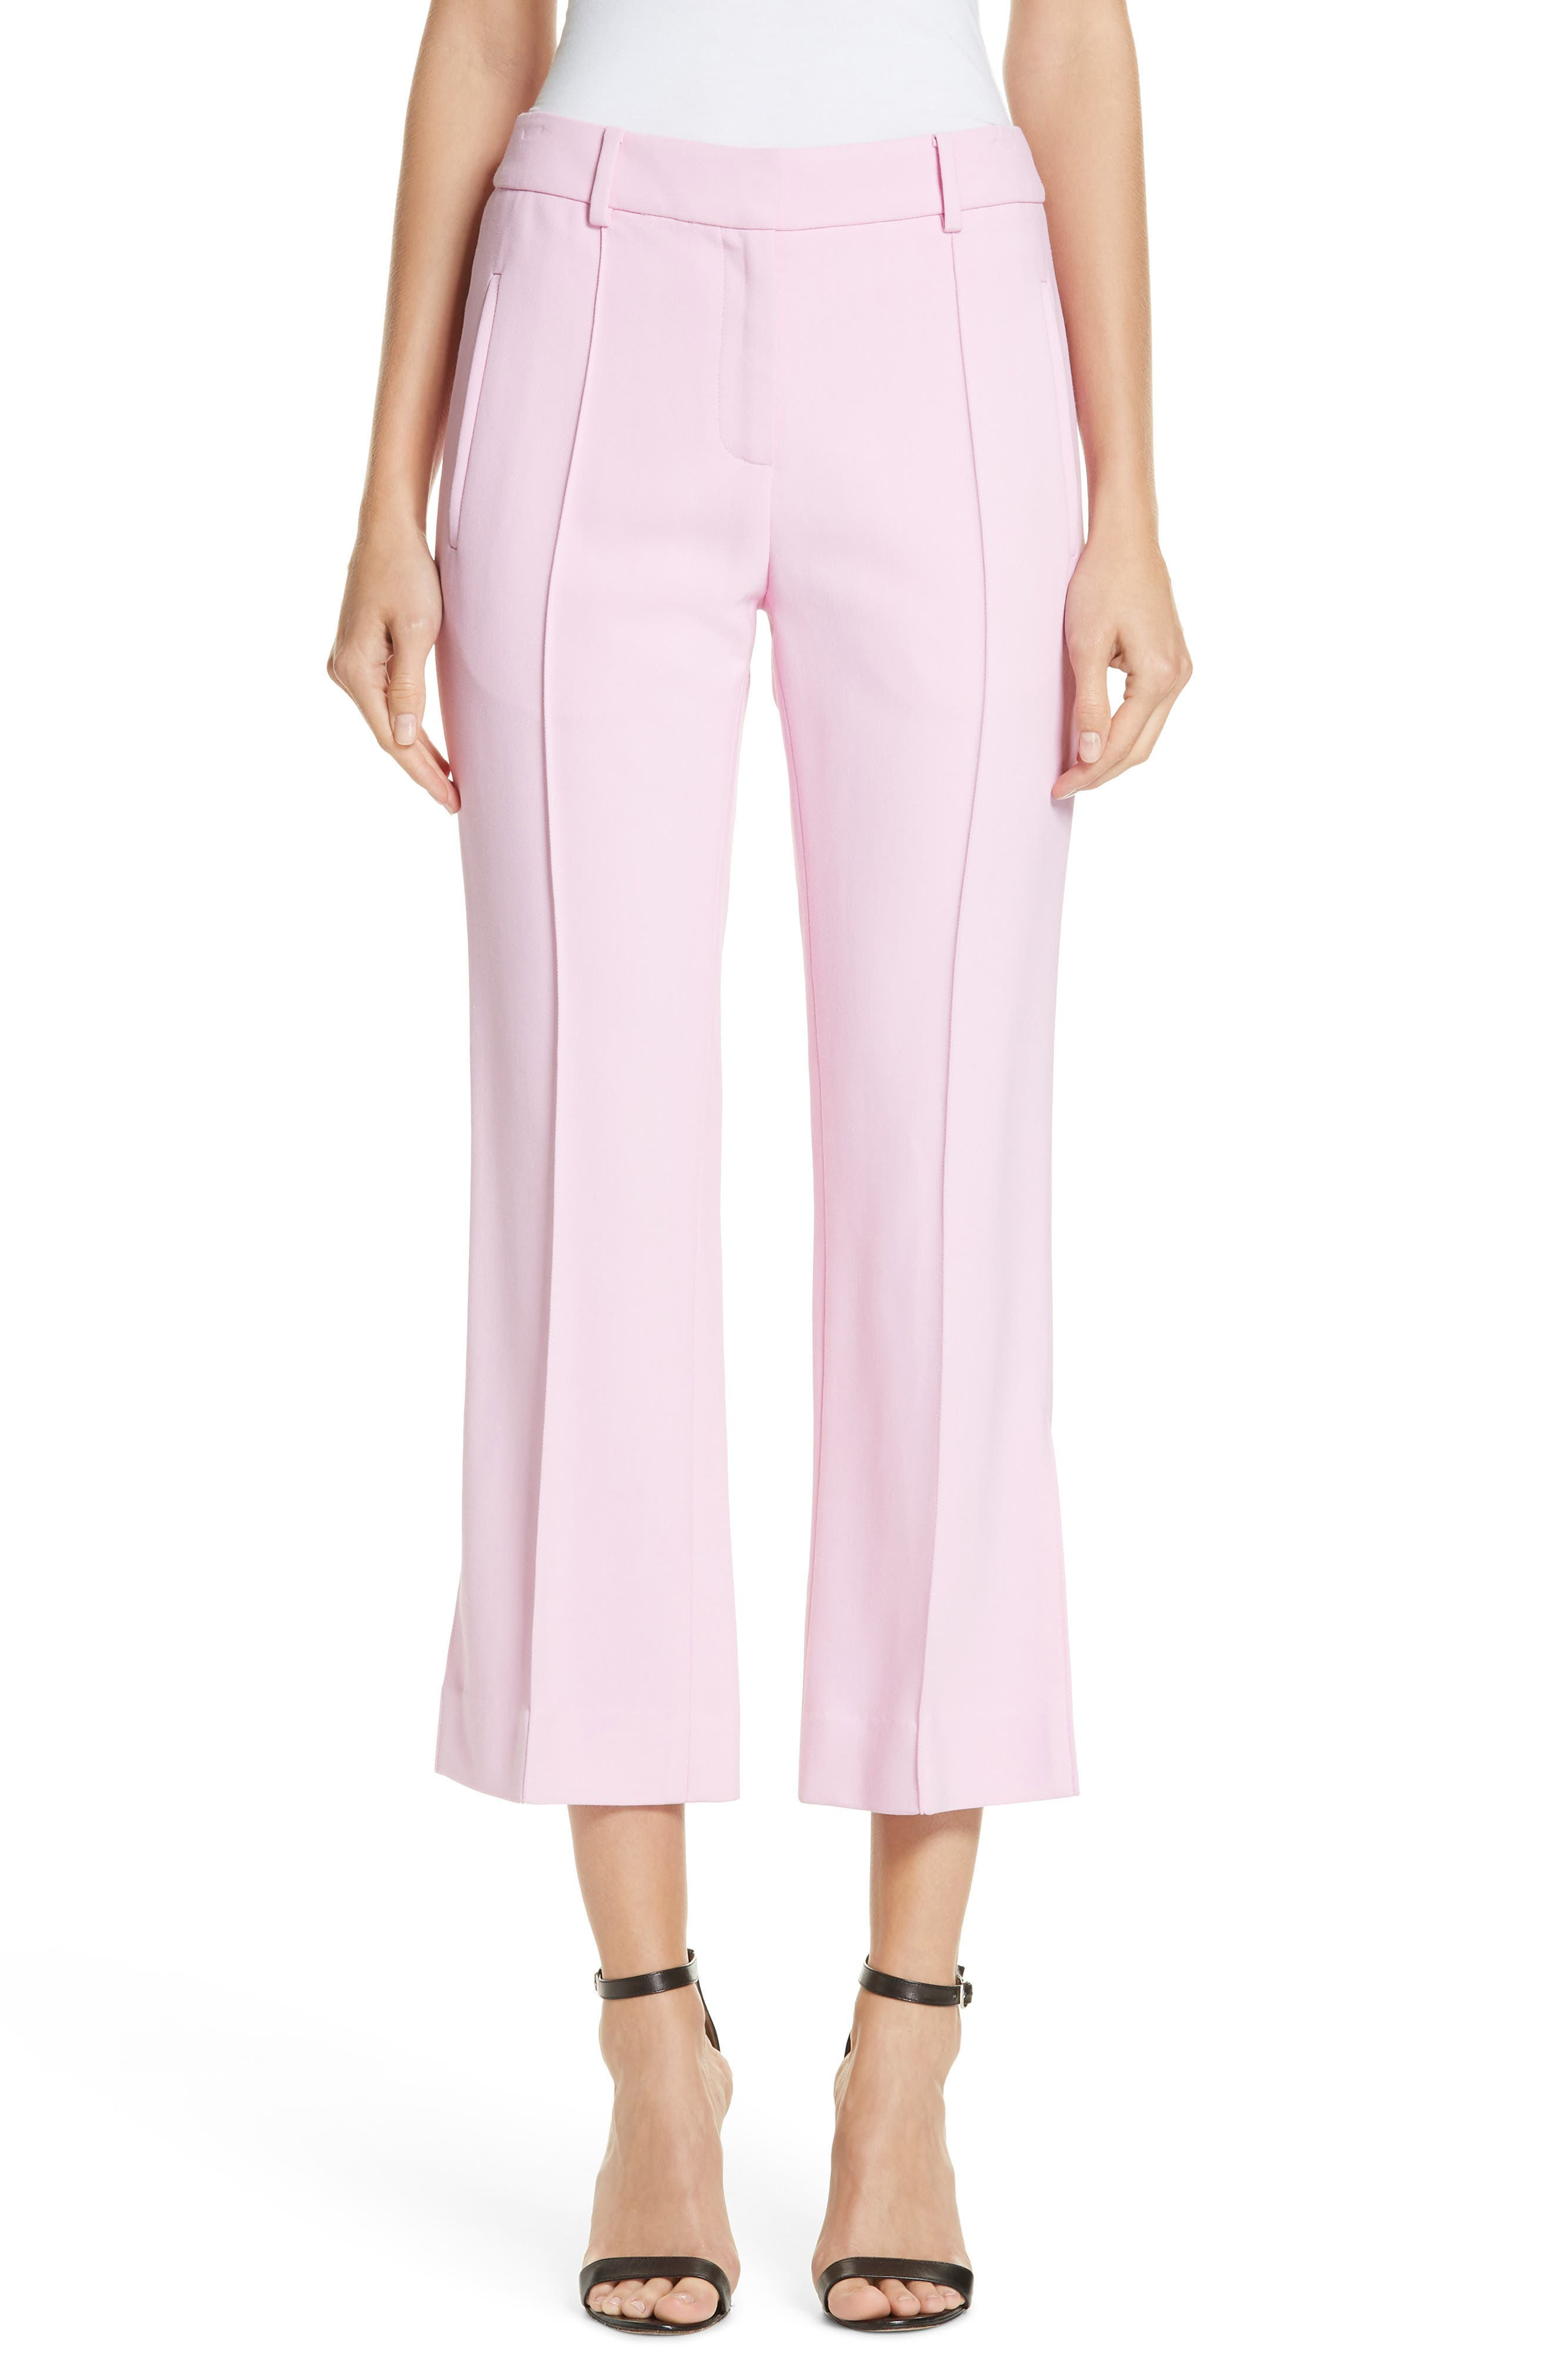 Khaite Marianne Crop Flare Pants, Pink